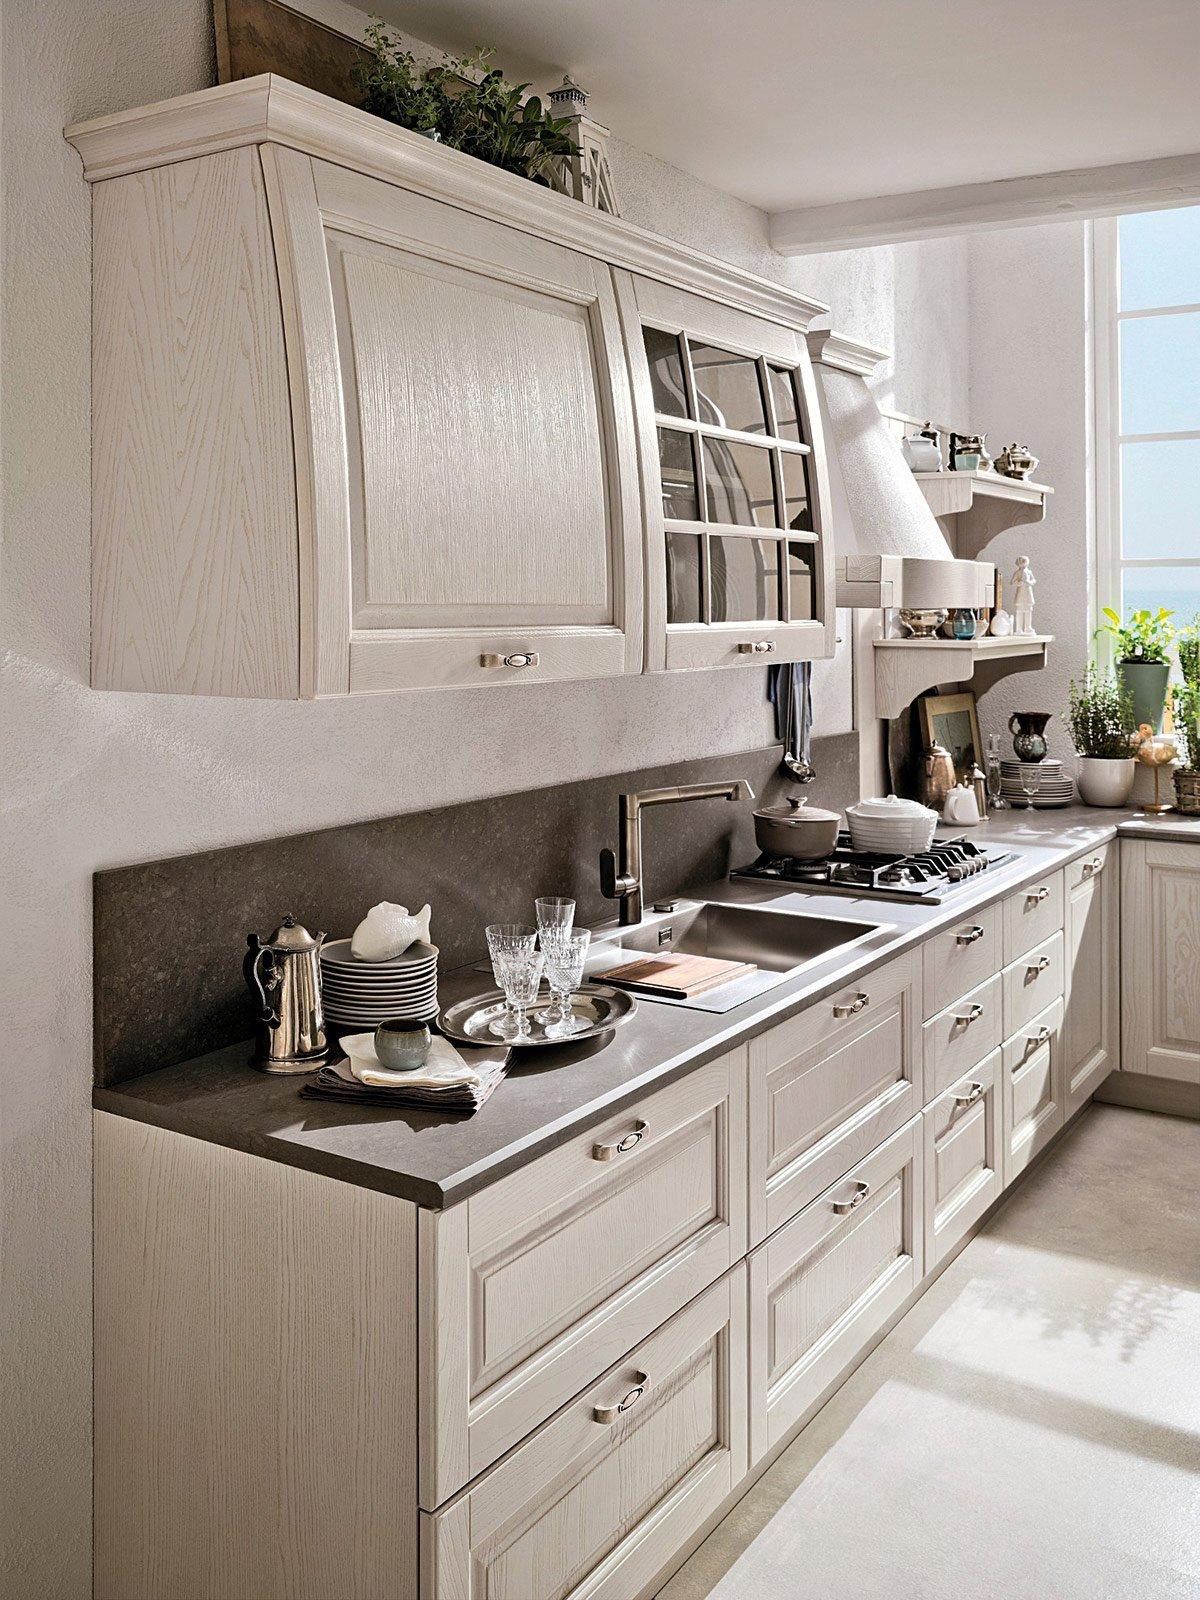 Cucine country stile tradizionale o new classic cose di casa - Cucine in stile ...